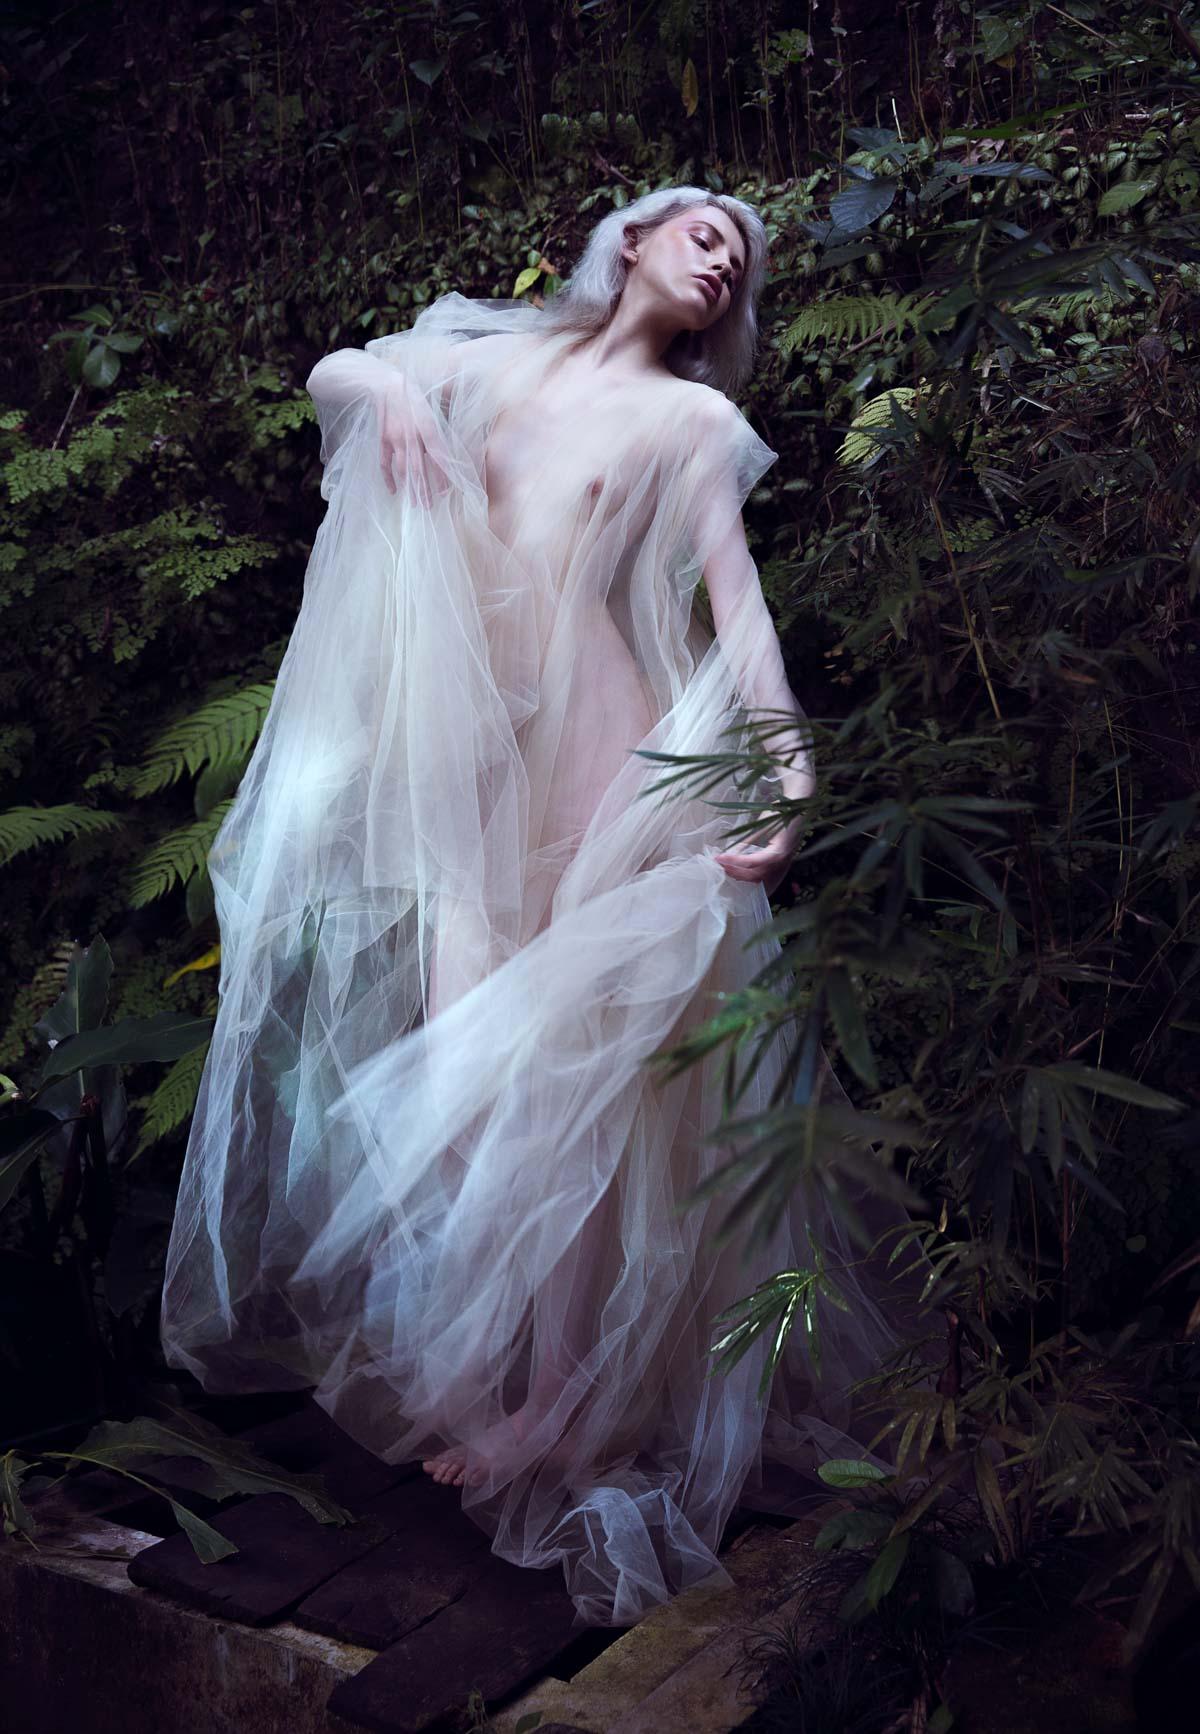 the_forest_magazine_amberly_valentine-neve-angie_angorro_0001